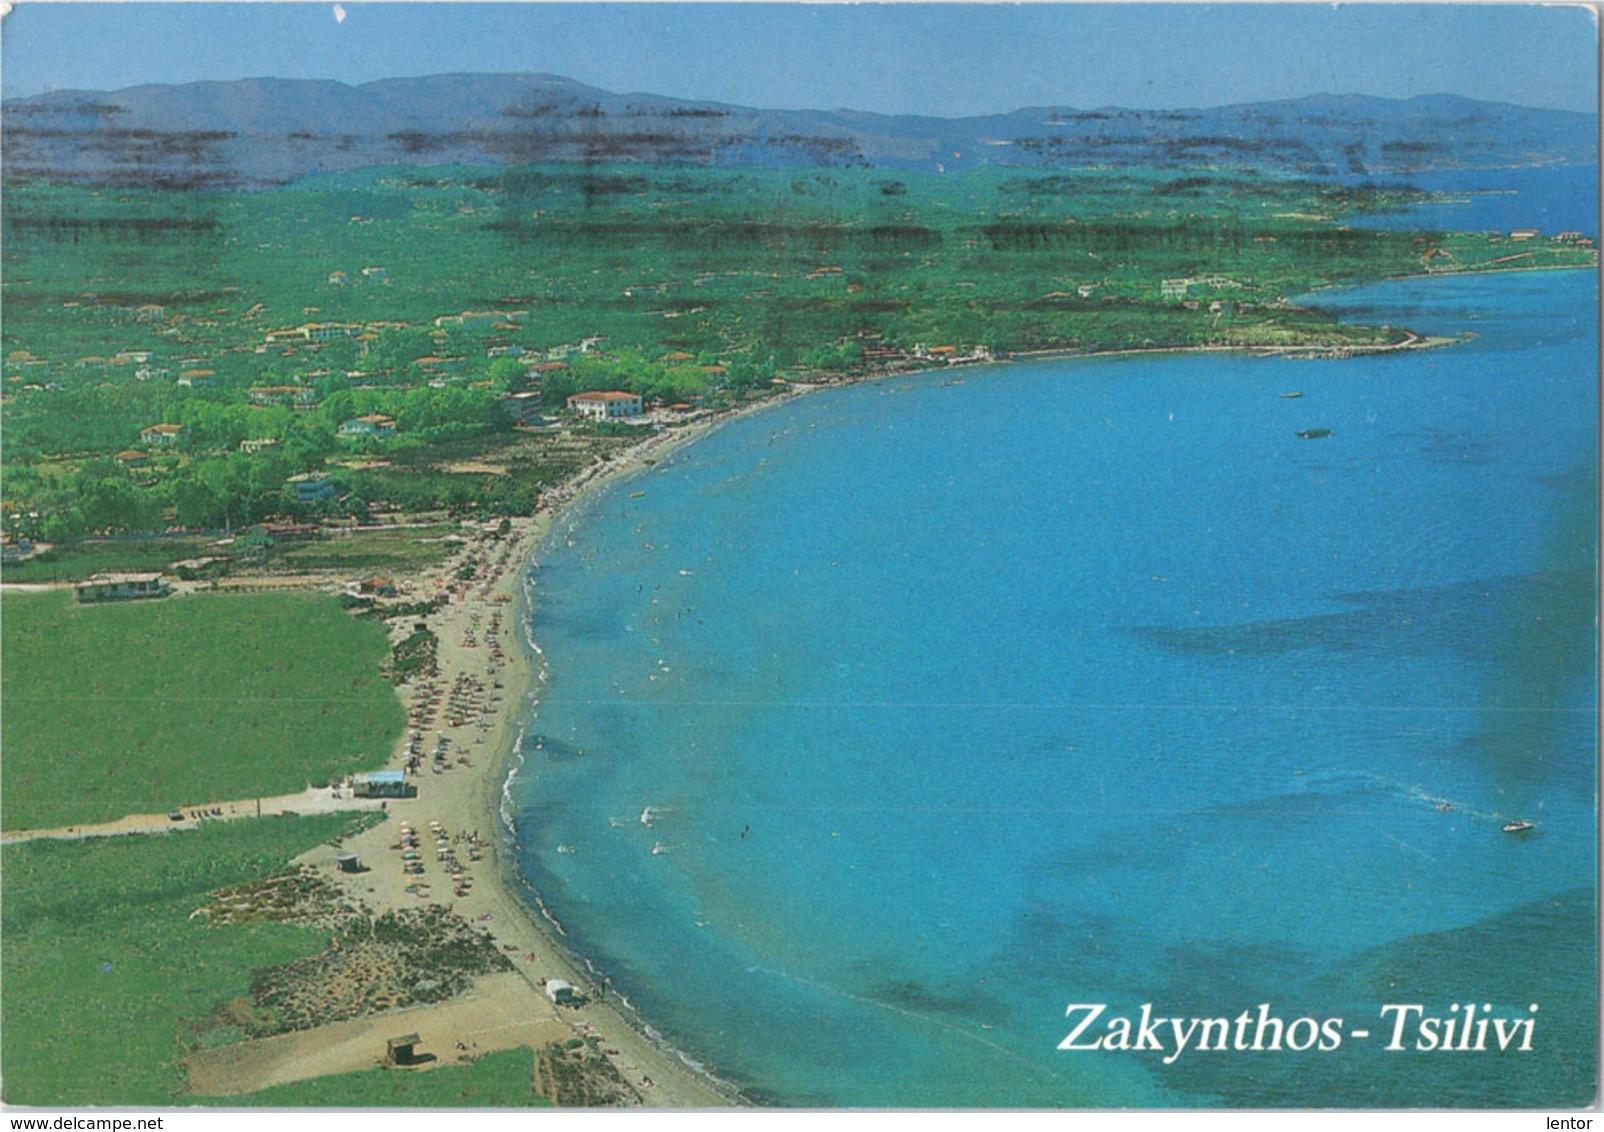 Pl 001 / Zakynthos. Tsilivi - Greece